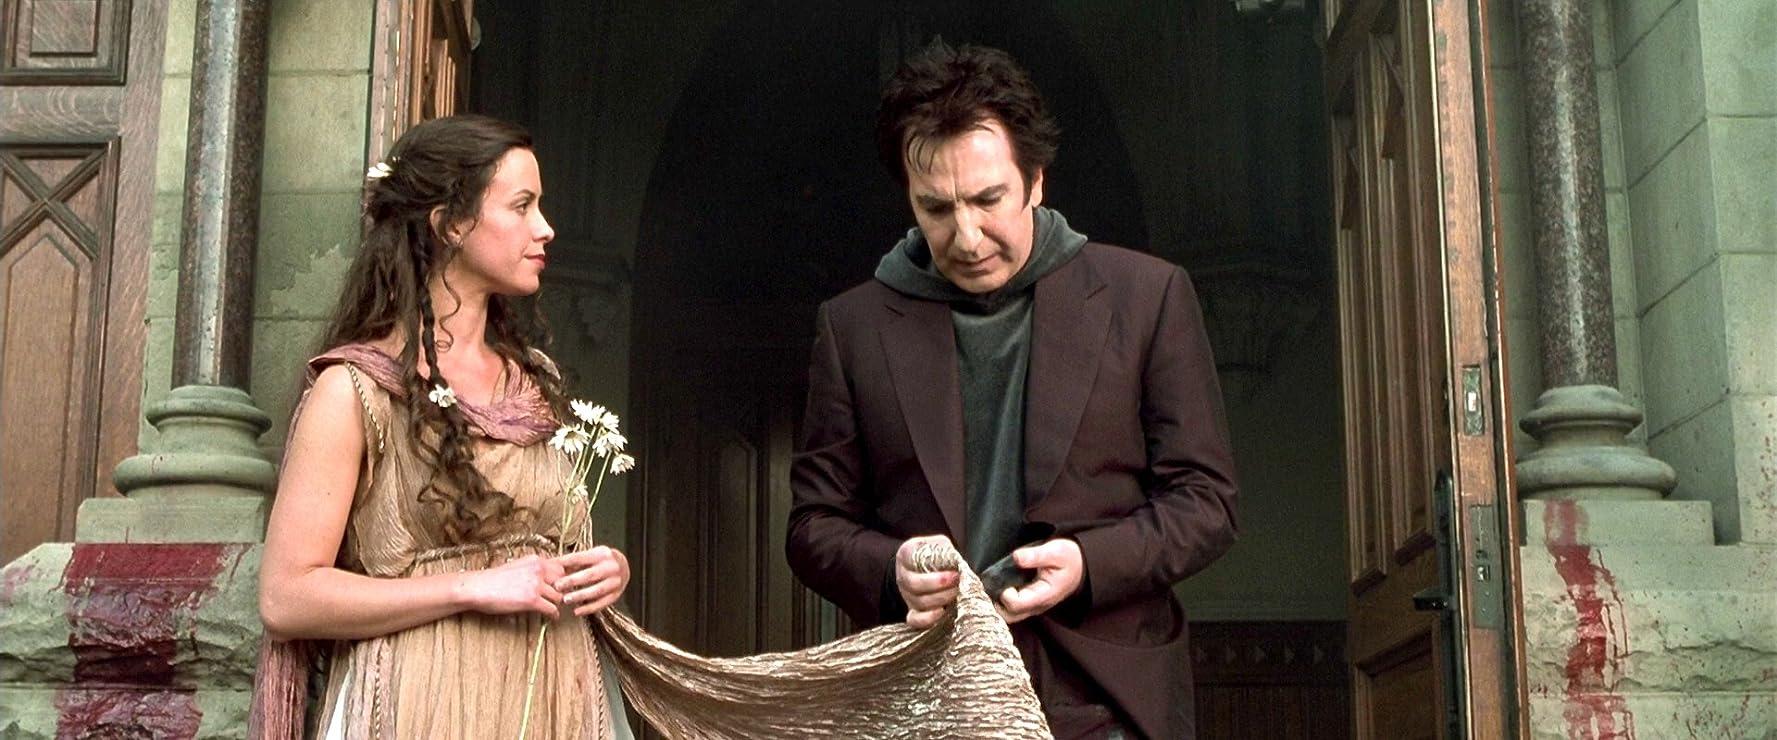 Alan Rickman and Alanis Morissette in Dogma (1999)